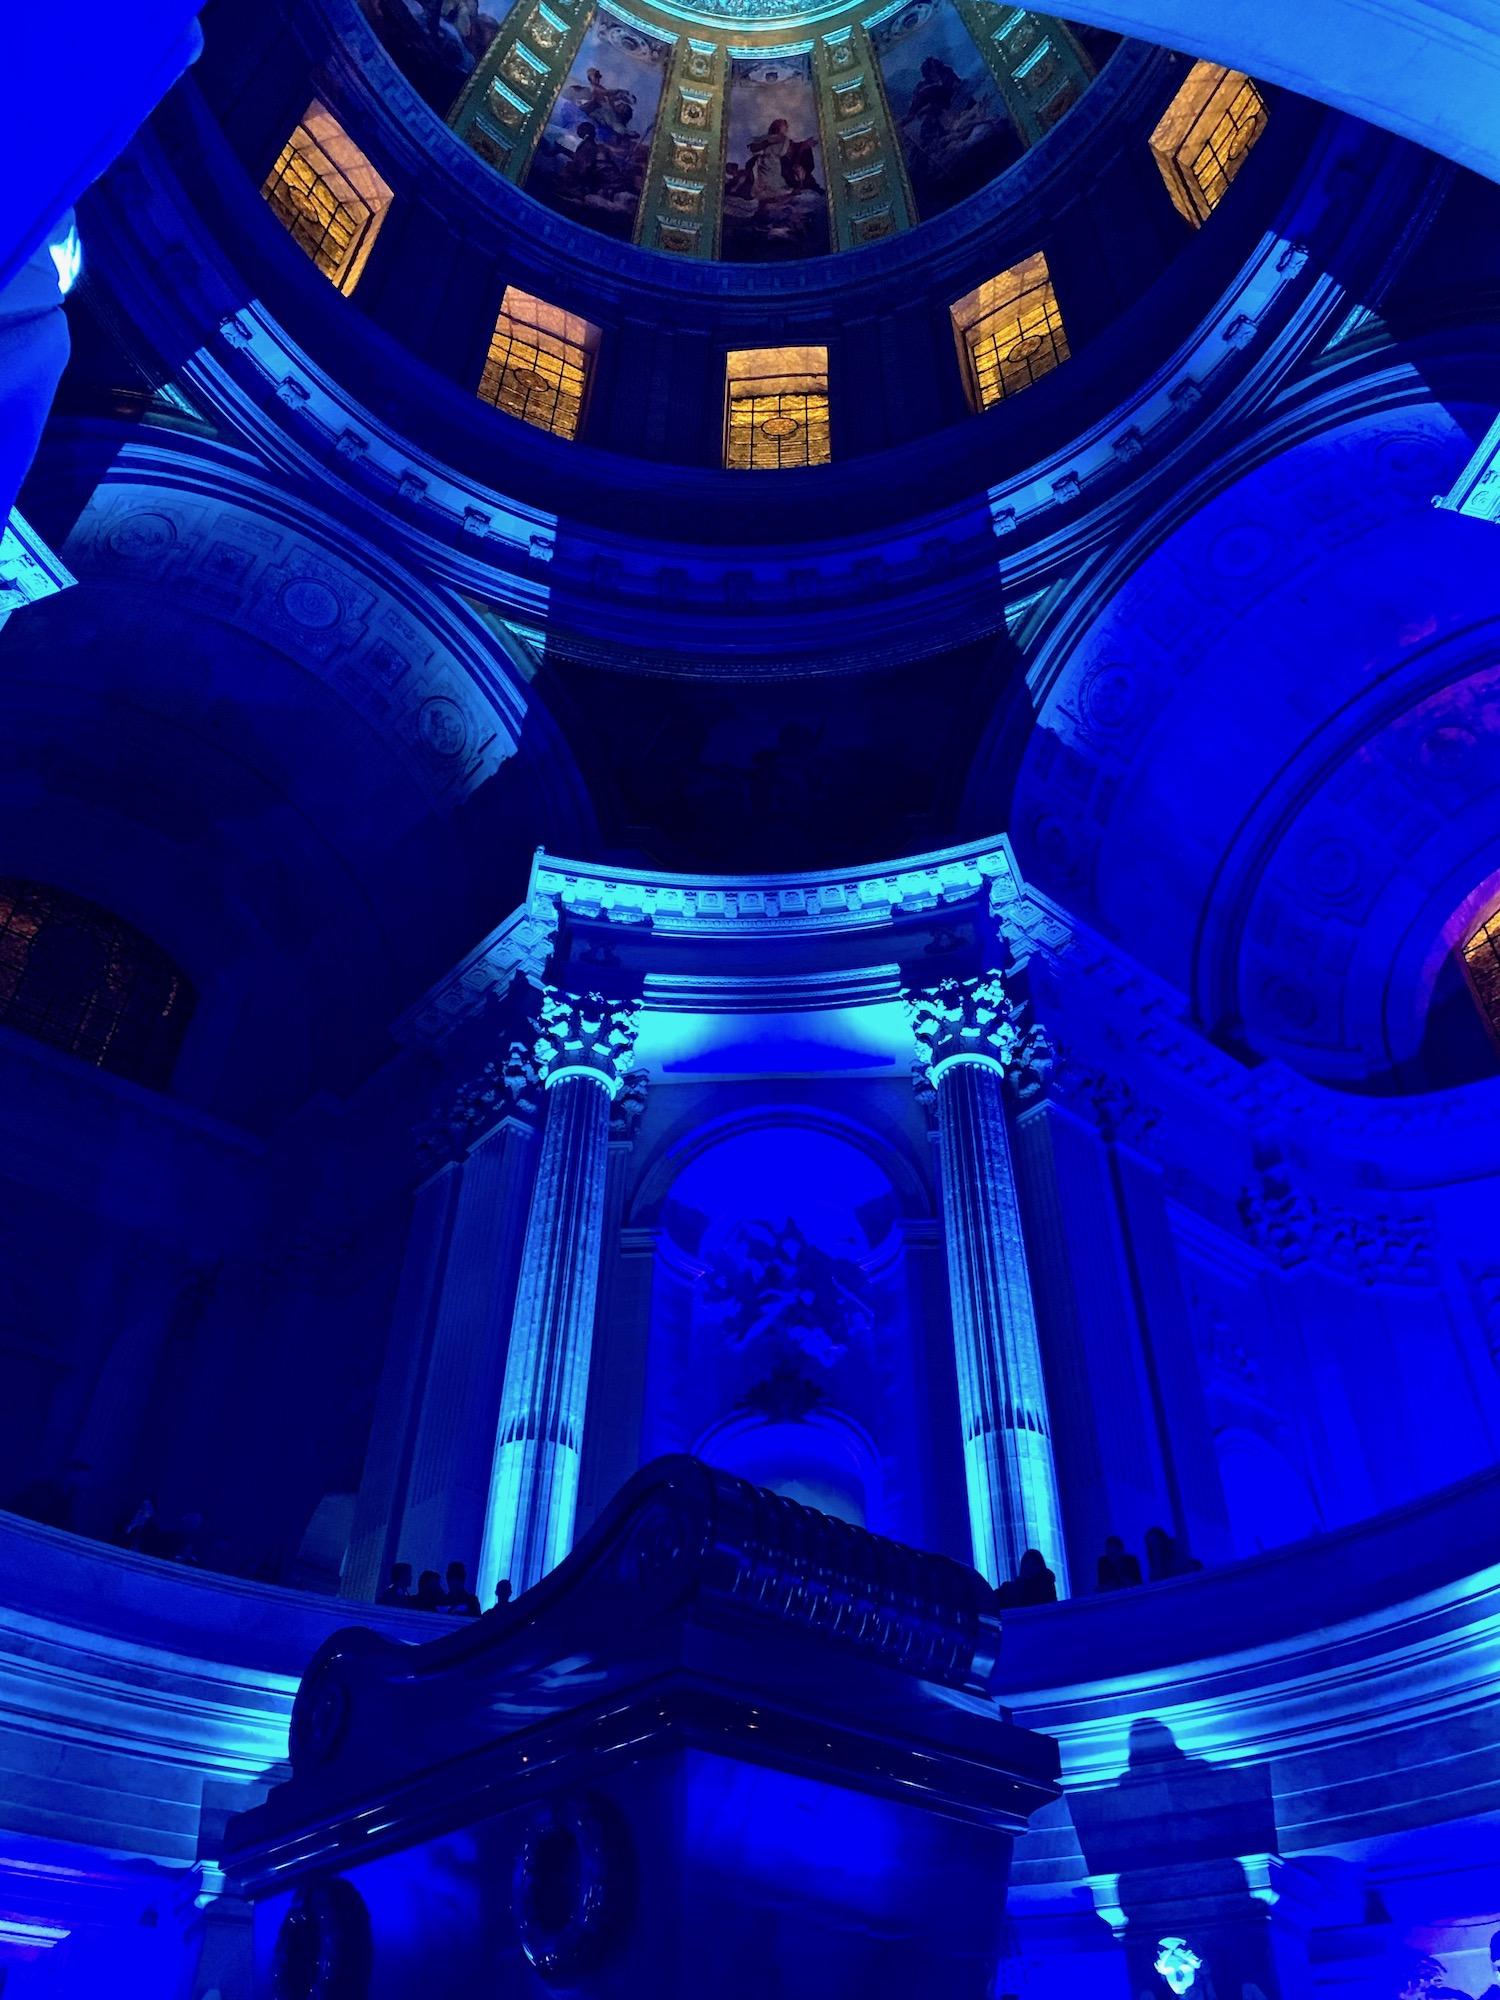 Dome Napoleon Tomb Blue